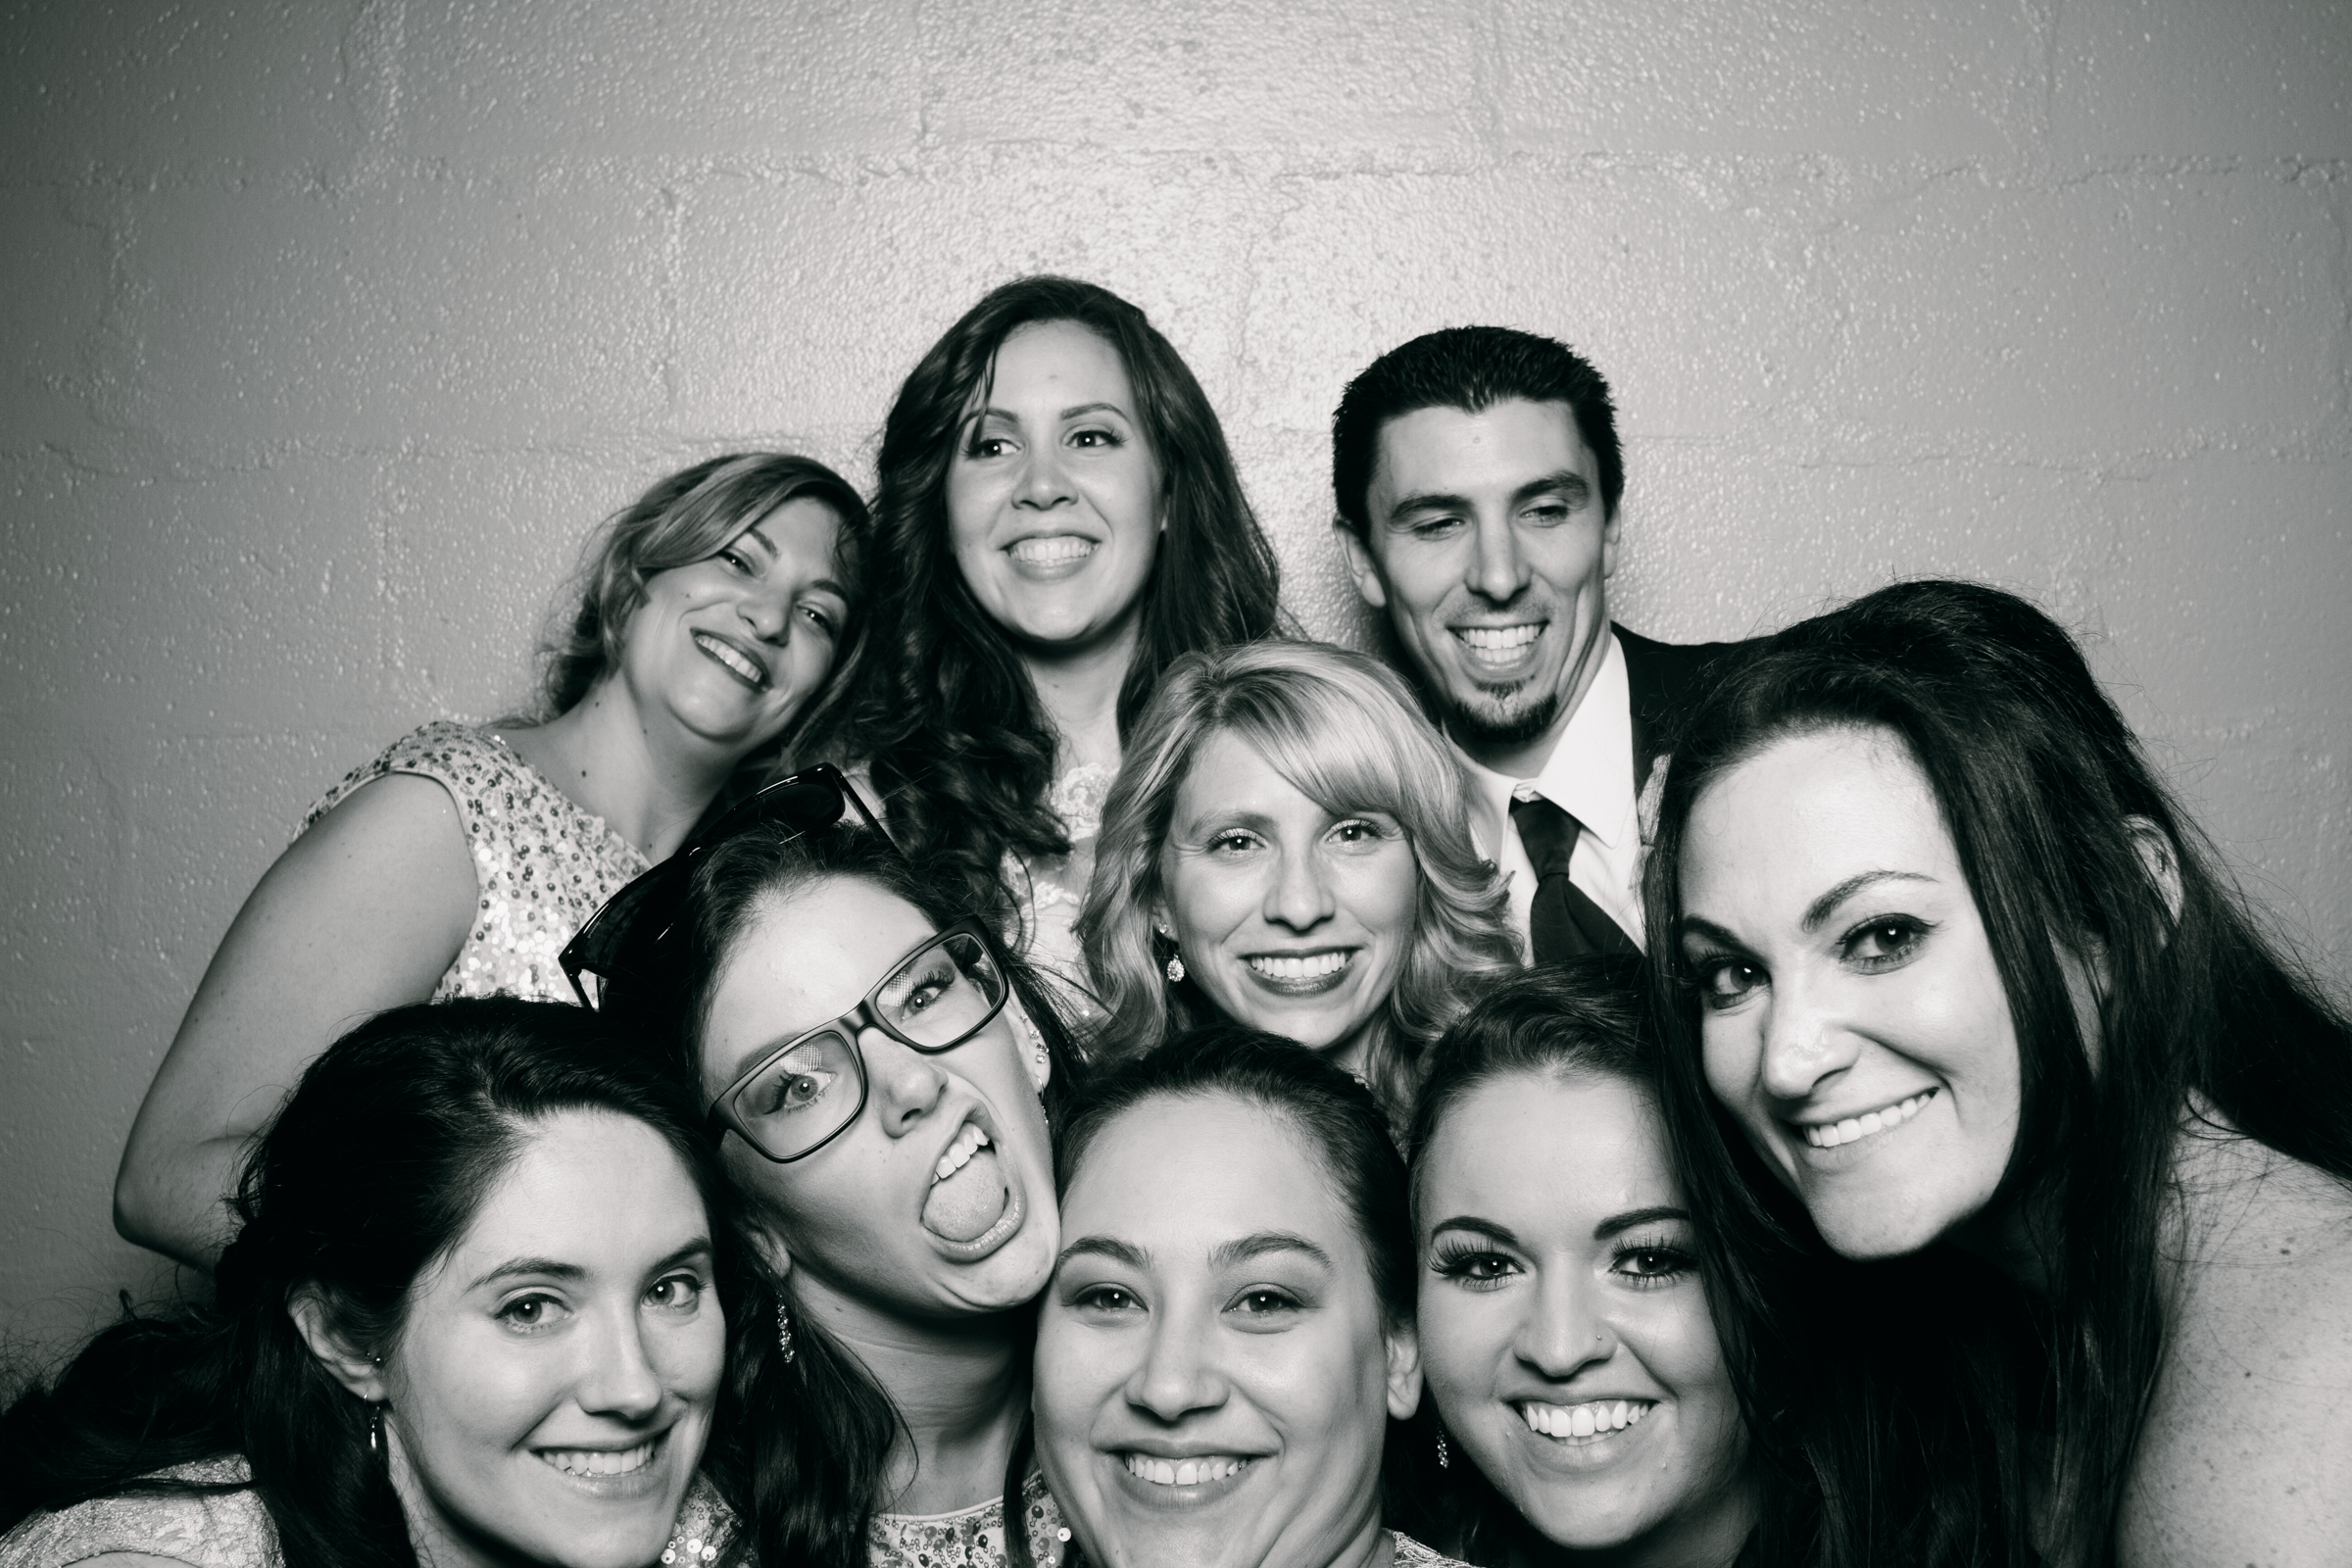 Ashley-John-Wedding-Photo-Booth-18.jpg